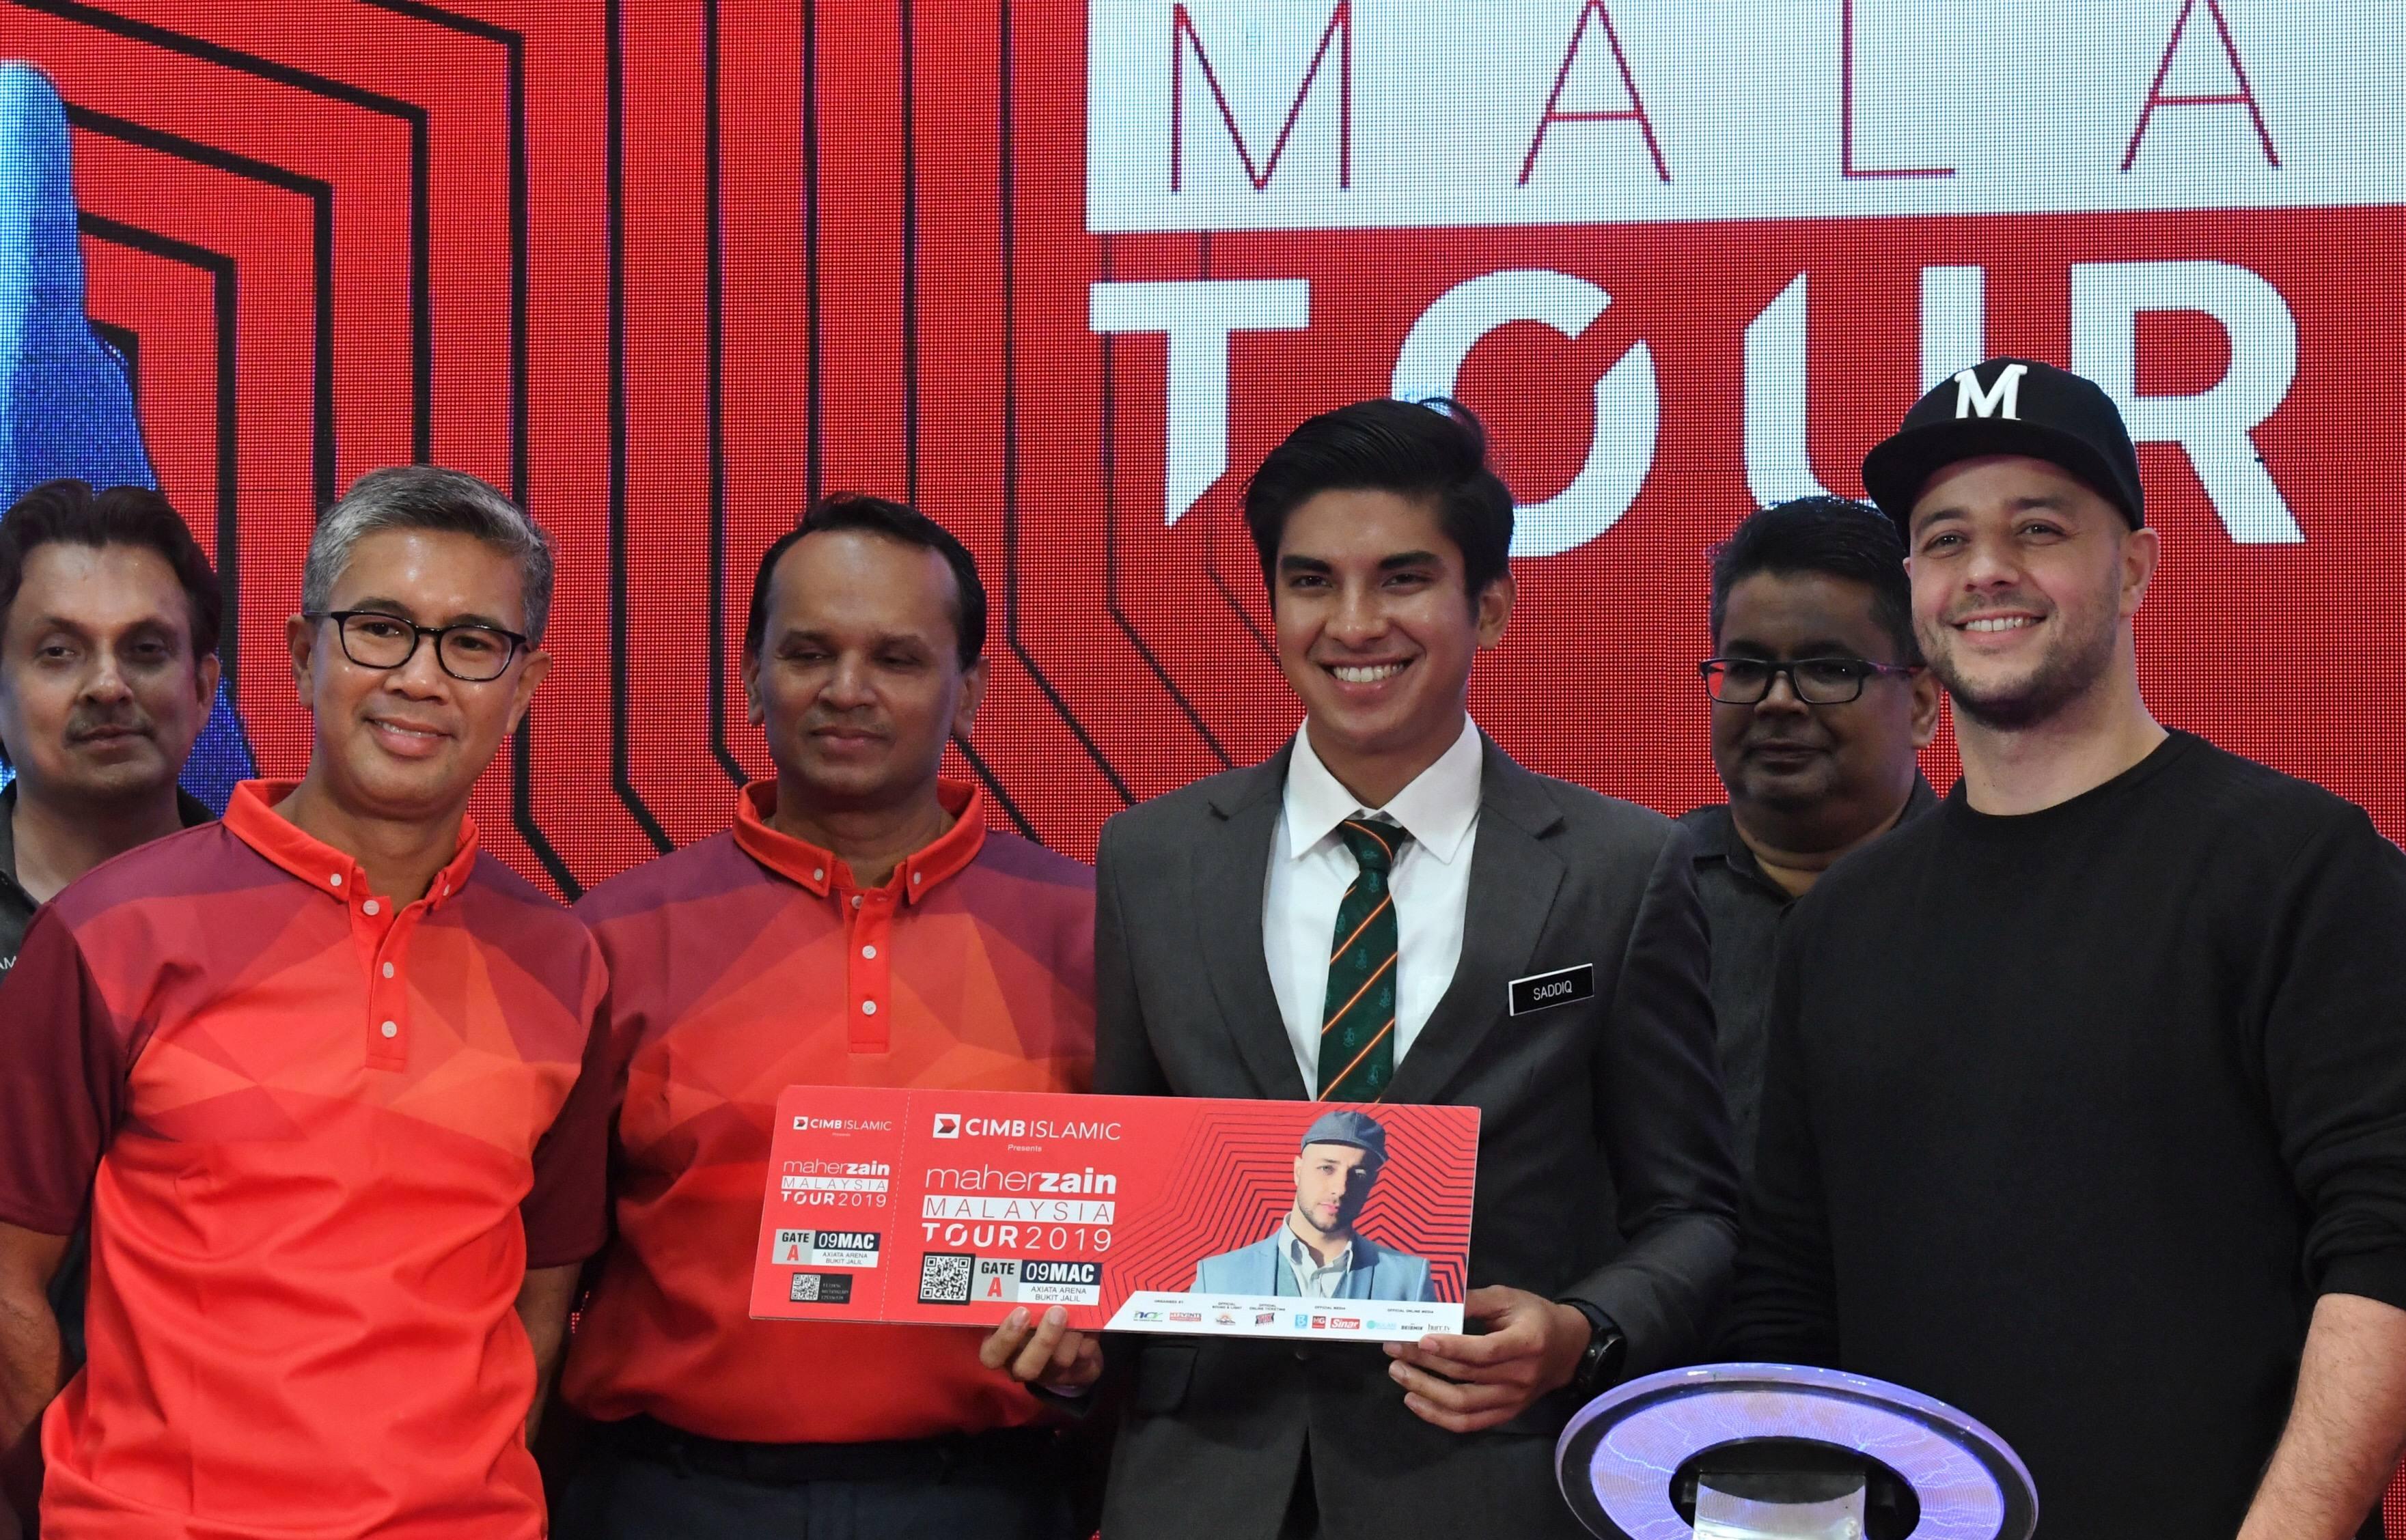 Syed Saddiq treats his mum to Maher Zain concert | The Star Online